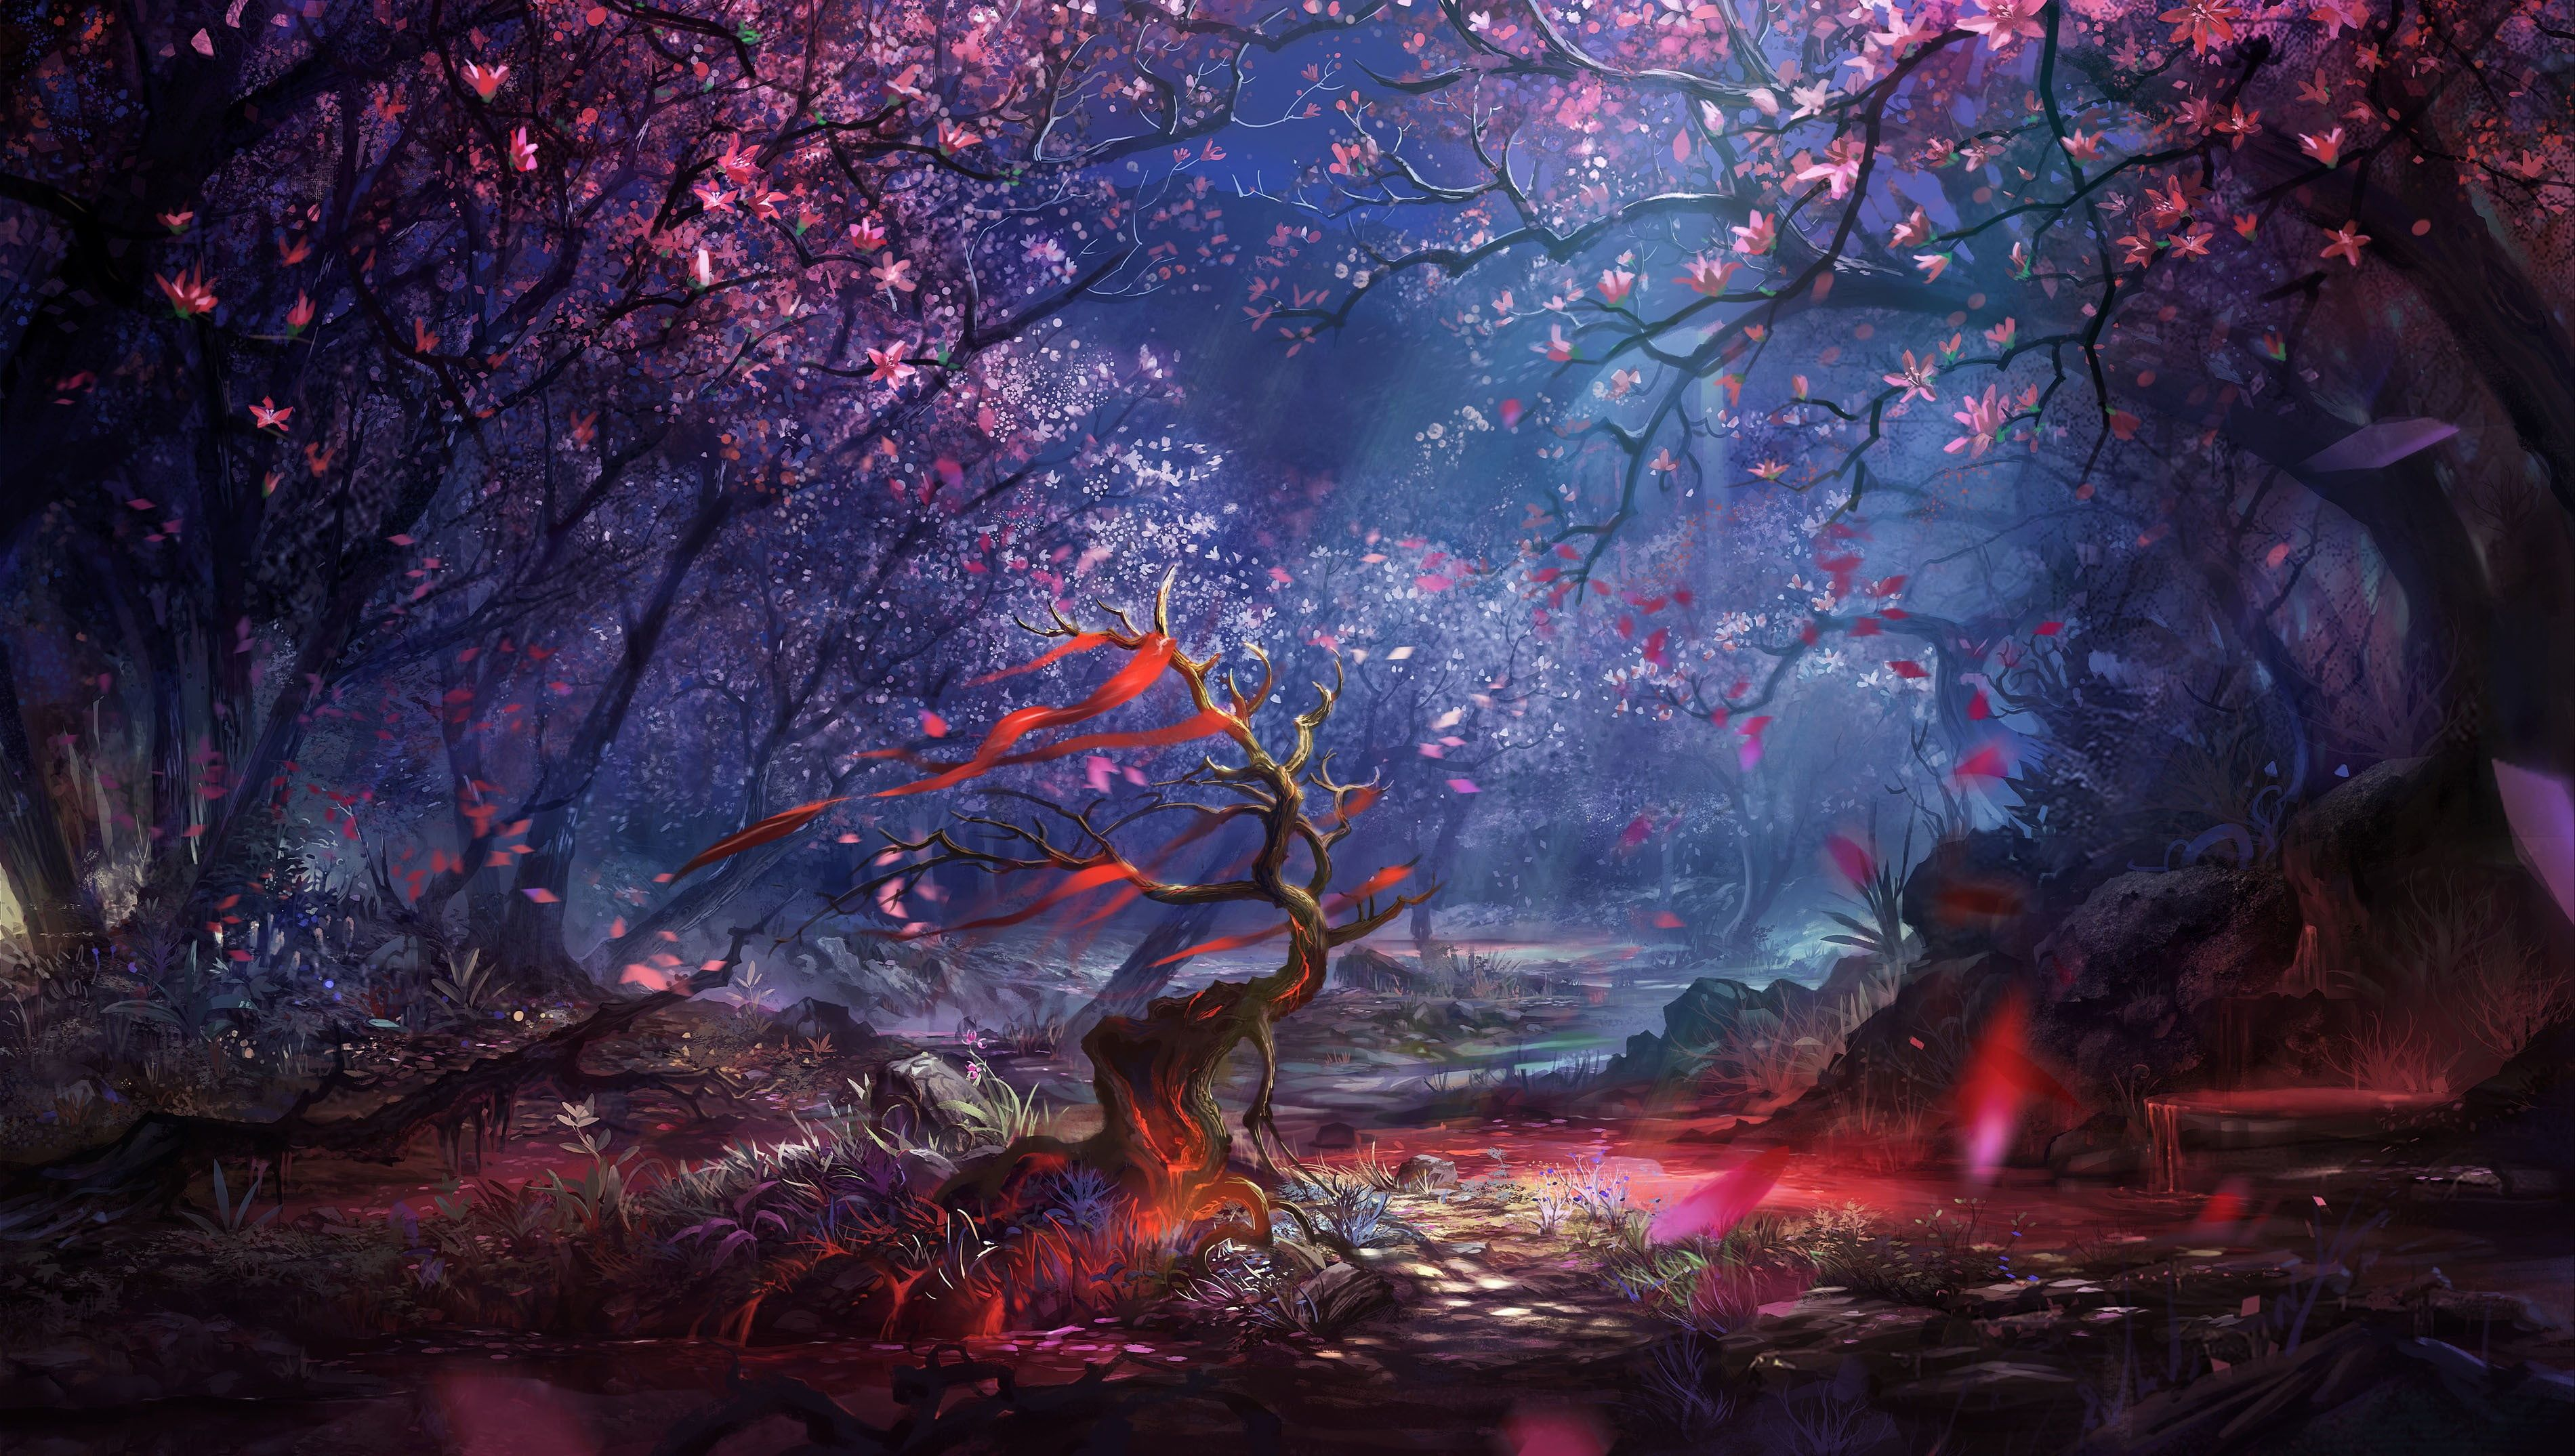 Pink And Brown Trees Digital Wallpaper Artwork Fantasy Art Digital Art Forest Trees Colorful Land In 2020 Fantasy Landscape Digital Artwork Fantasy Fantasy Forest